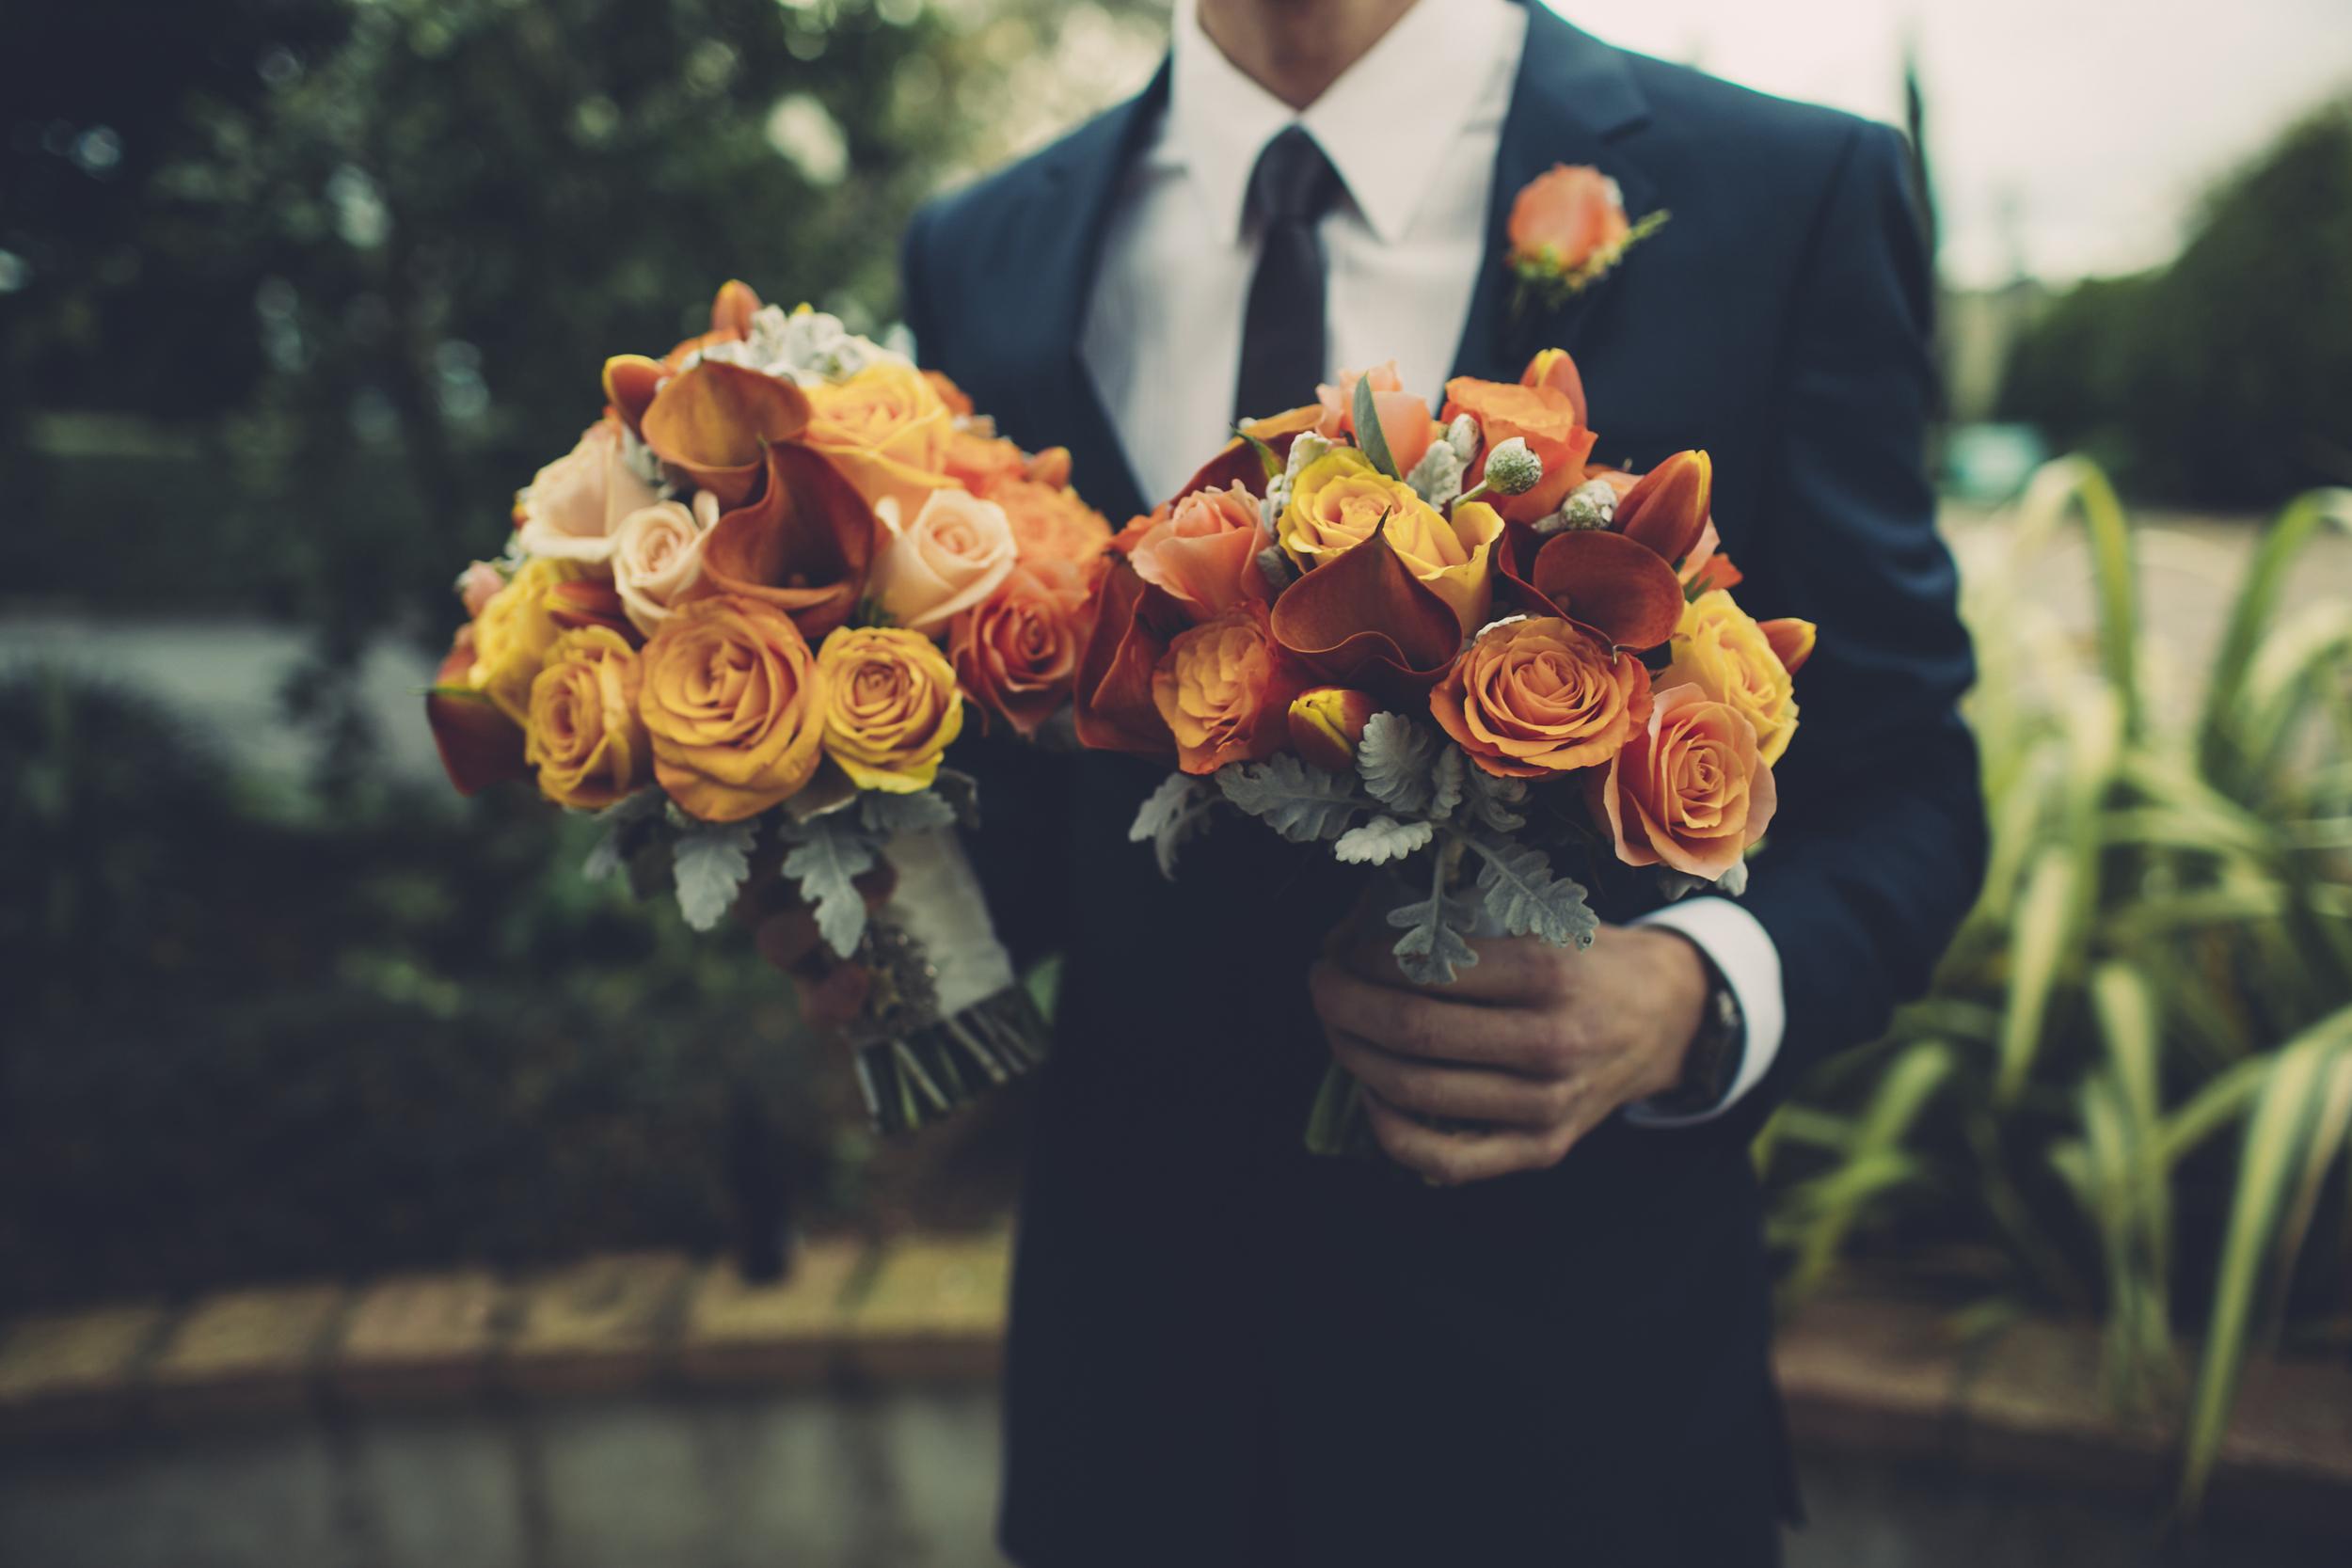 Claire's wedding bouquets